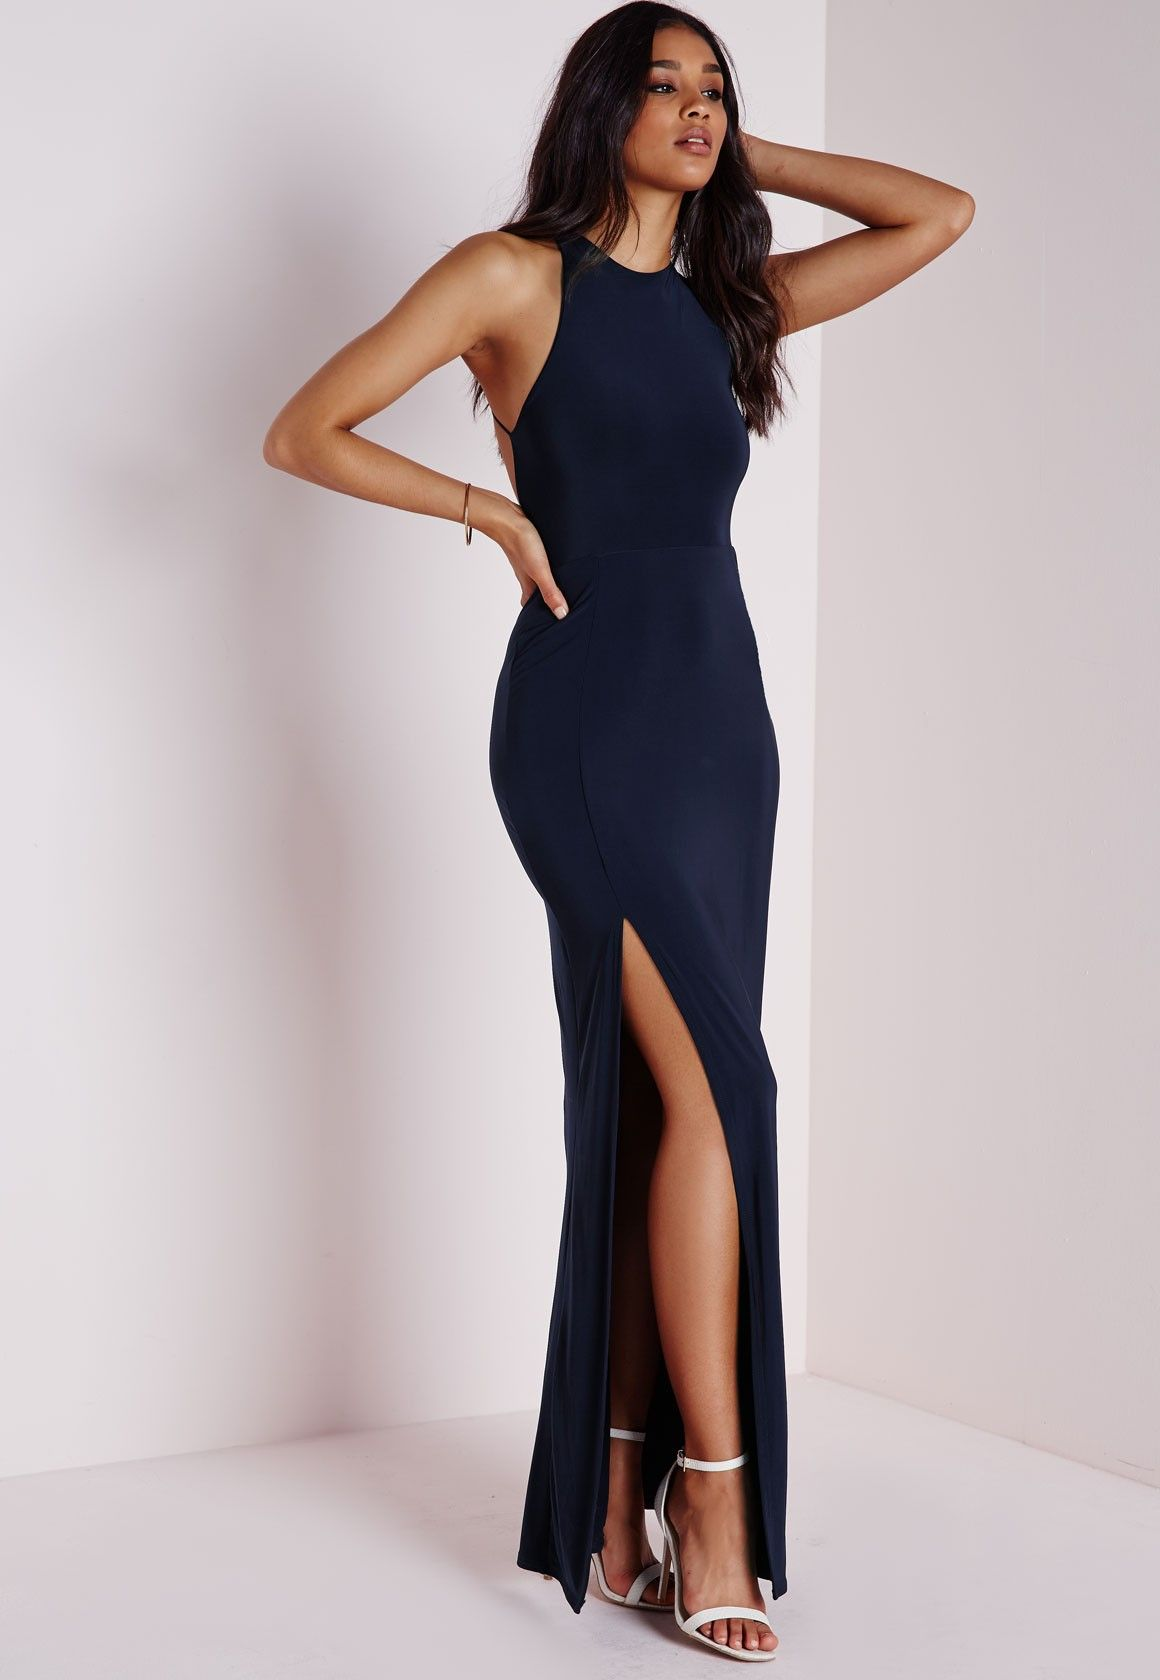 2539bba1b05 Nora High Neck Navy Maxi Dress - Missguided